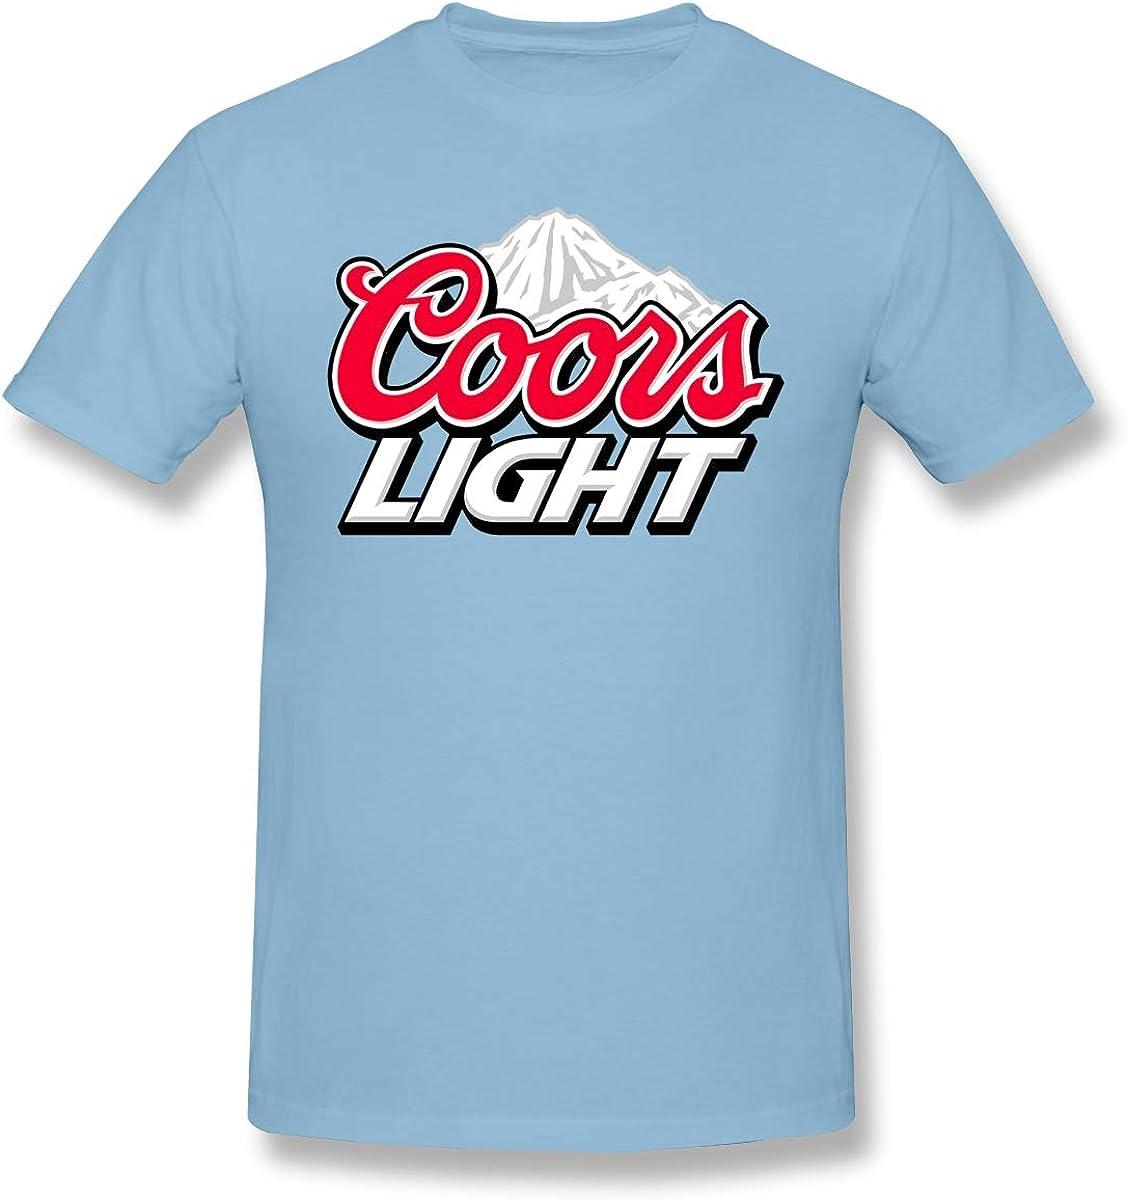 Pekivide Men Coors Light Logo Restoring Ancient Ways Gray T-Shirt